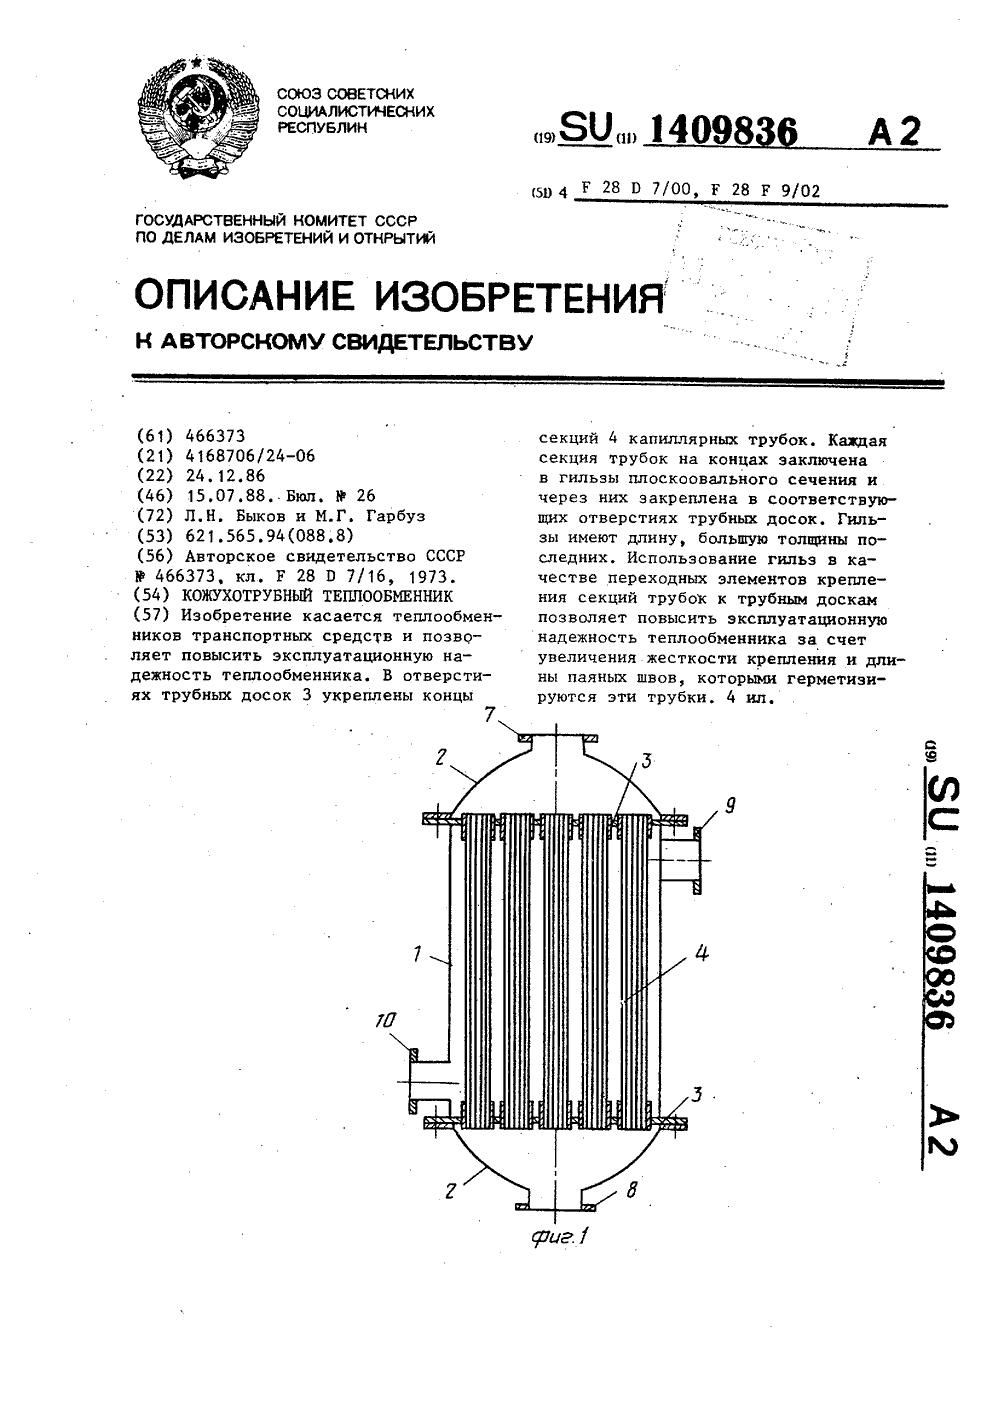 Пластинчатый теплообменник Sondex S8A Москва